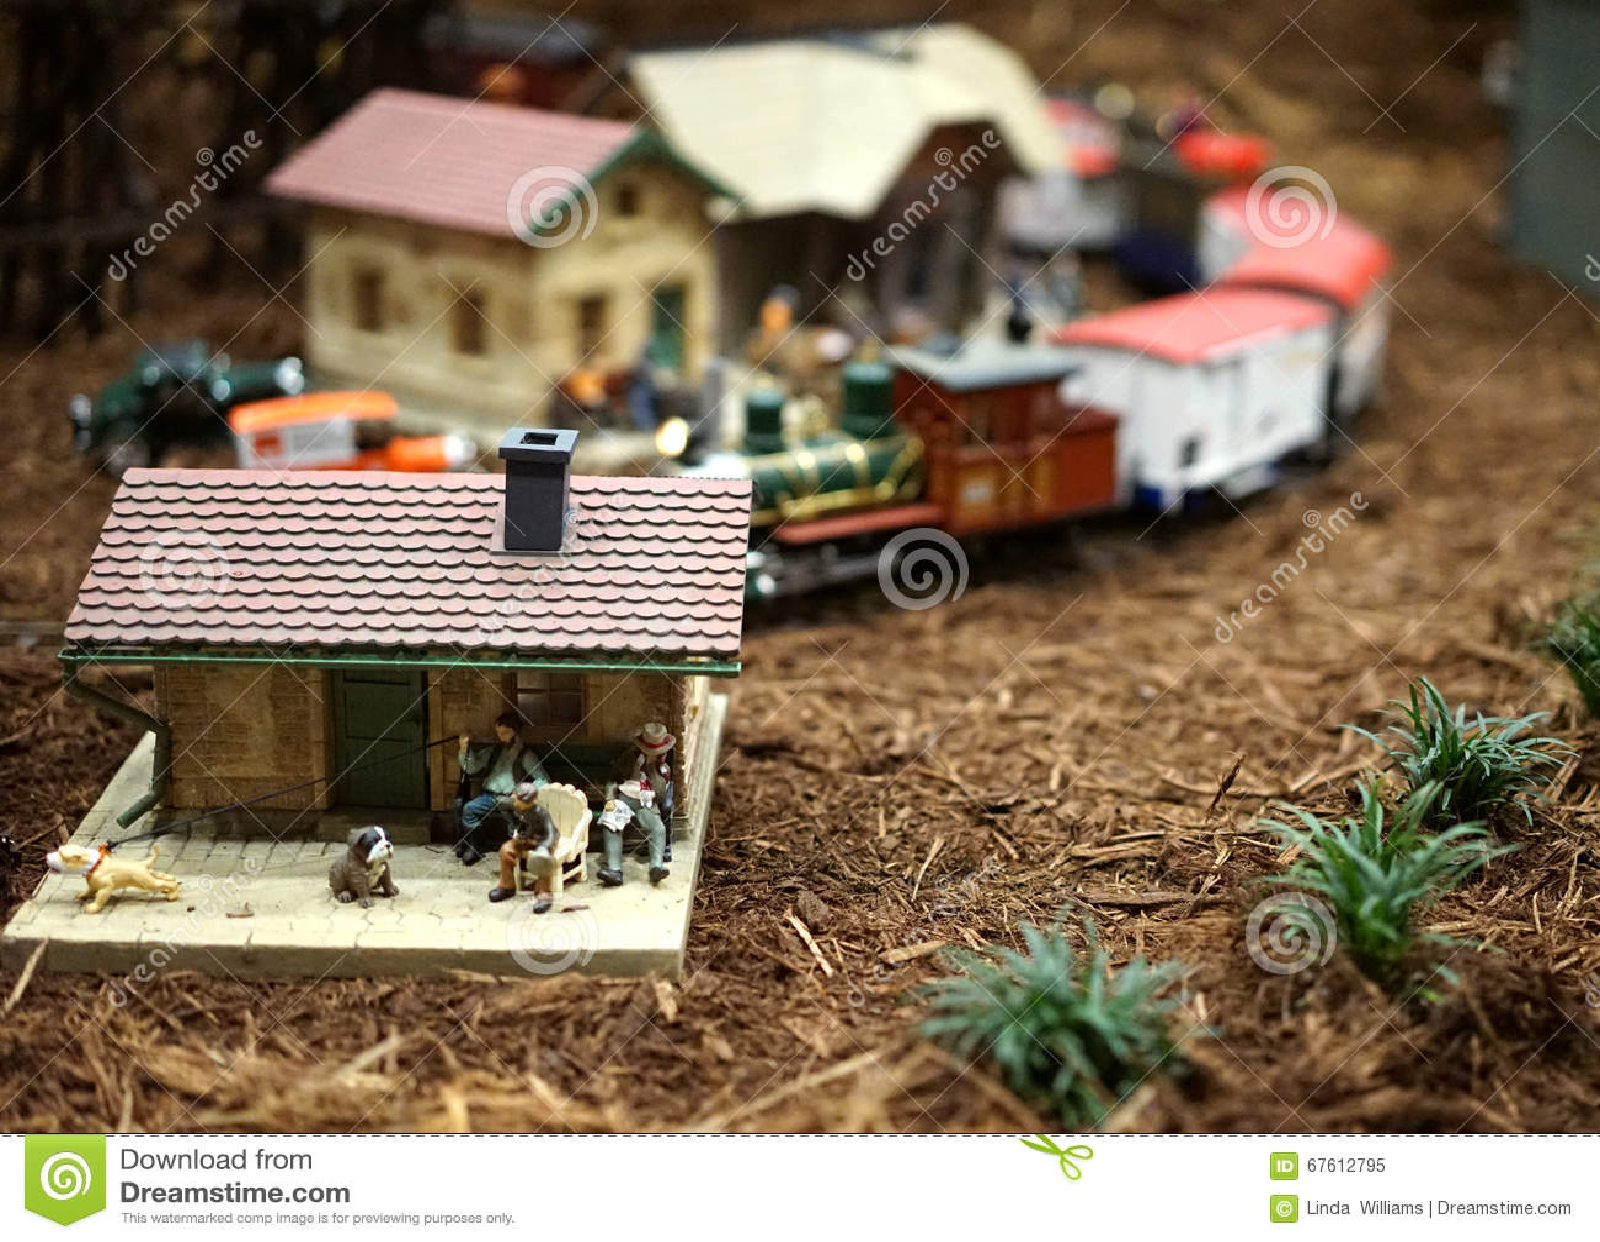 Miniature town and train scene